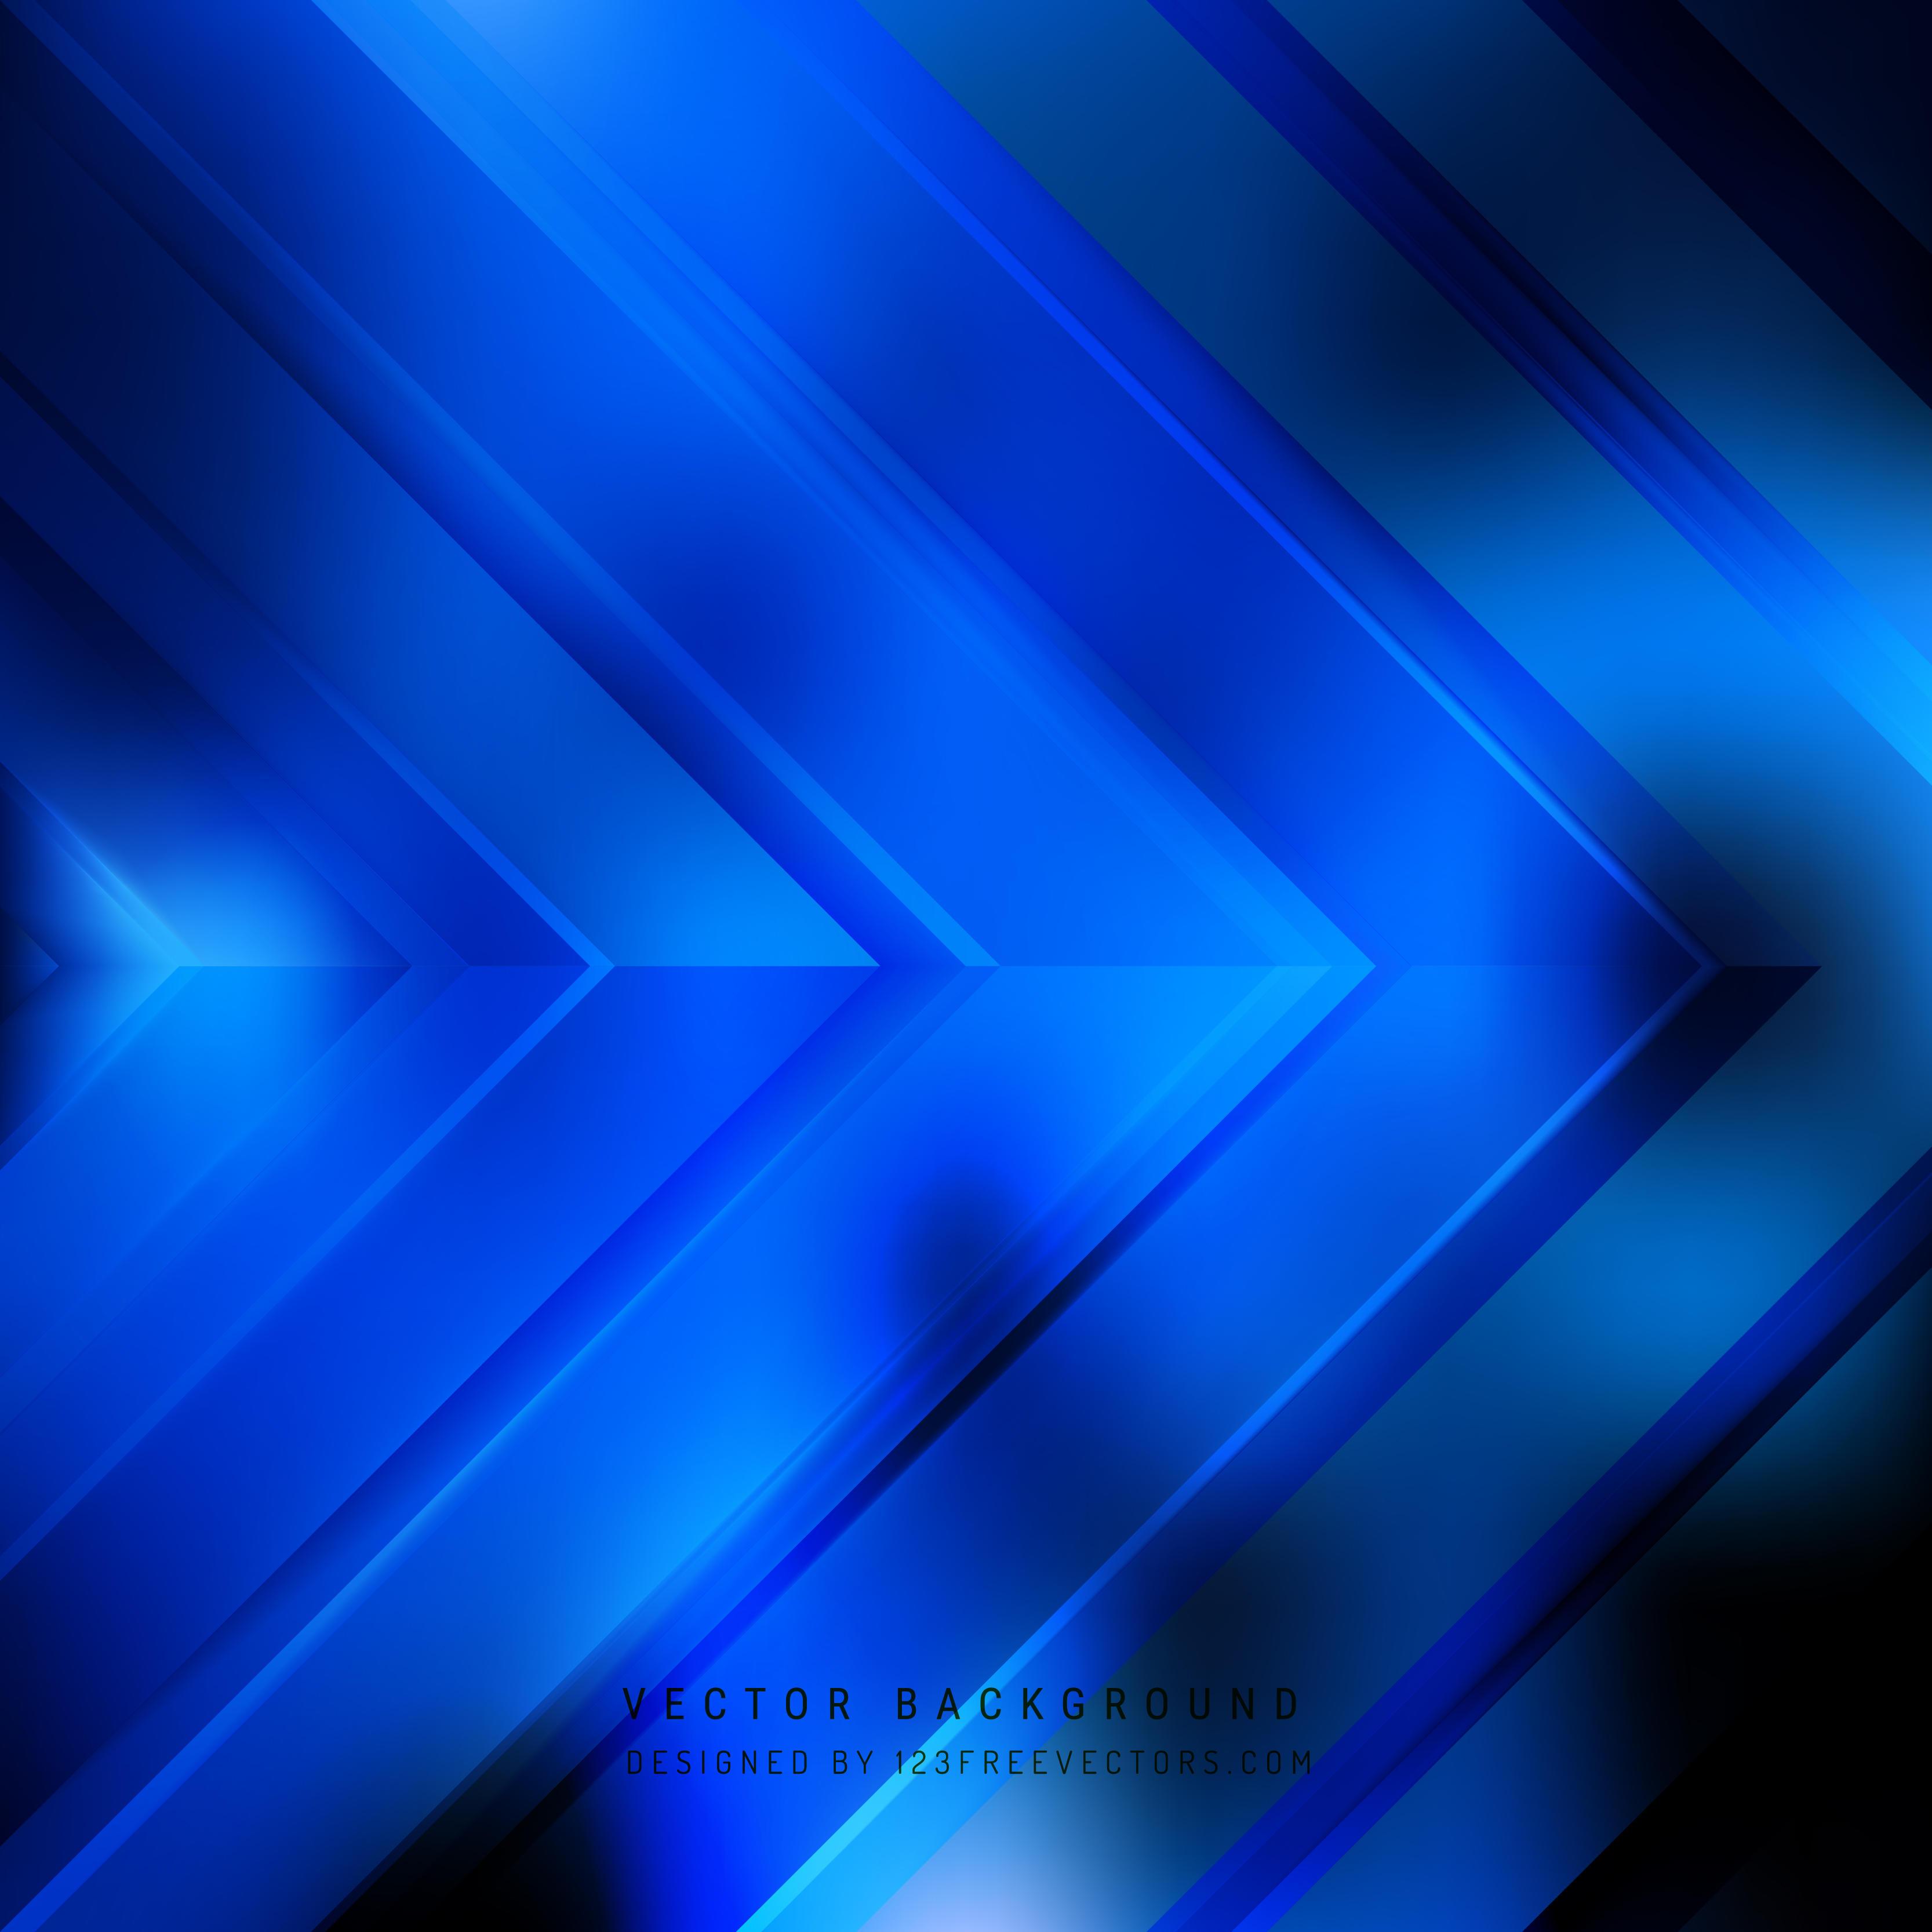 Navy Blue Arrow Background Design